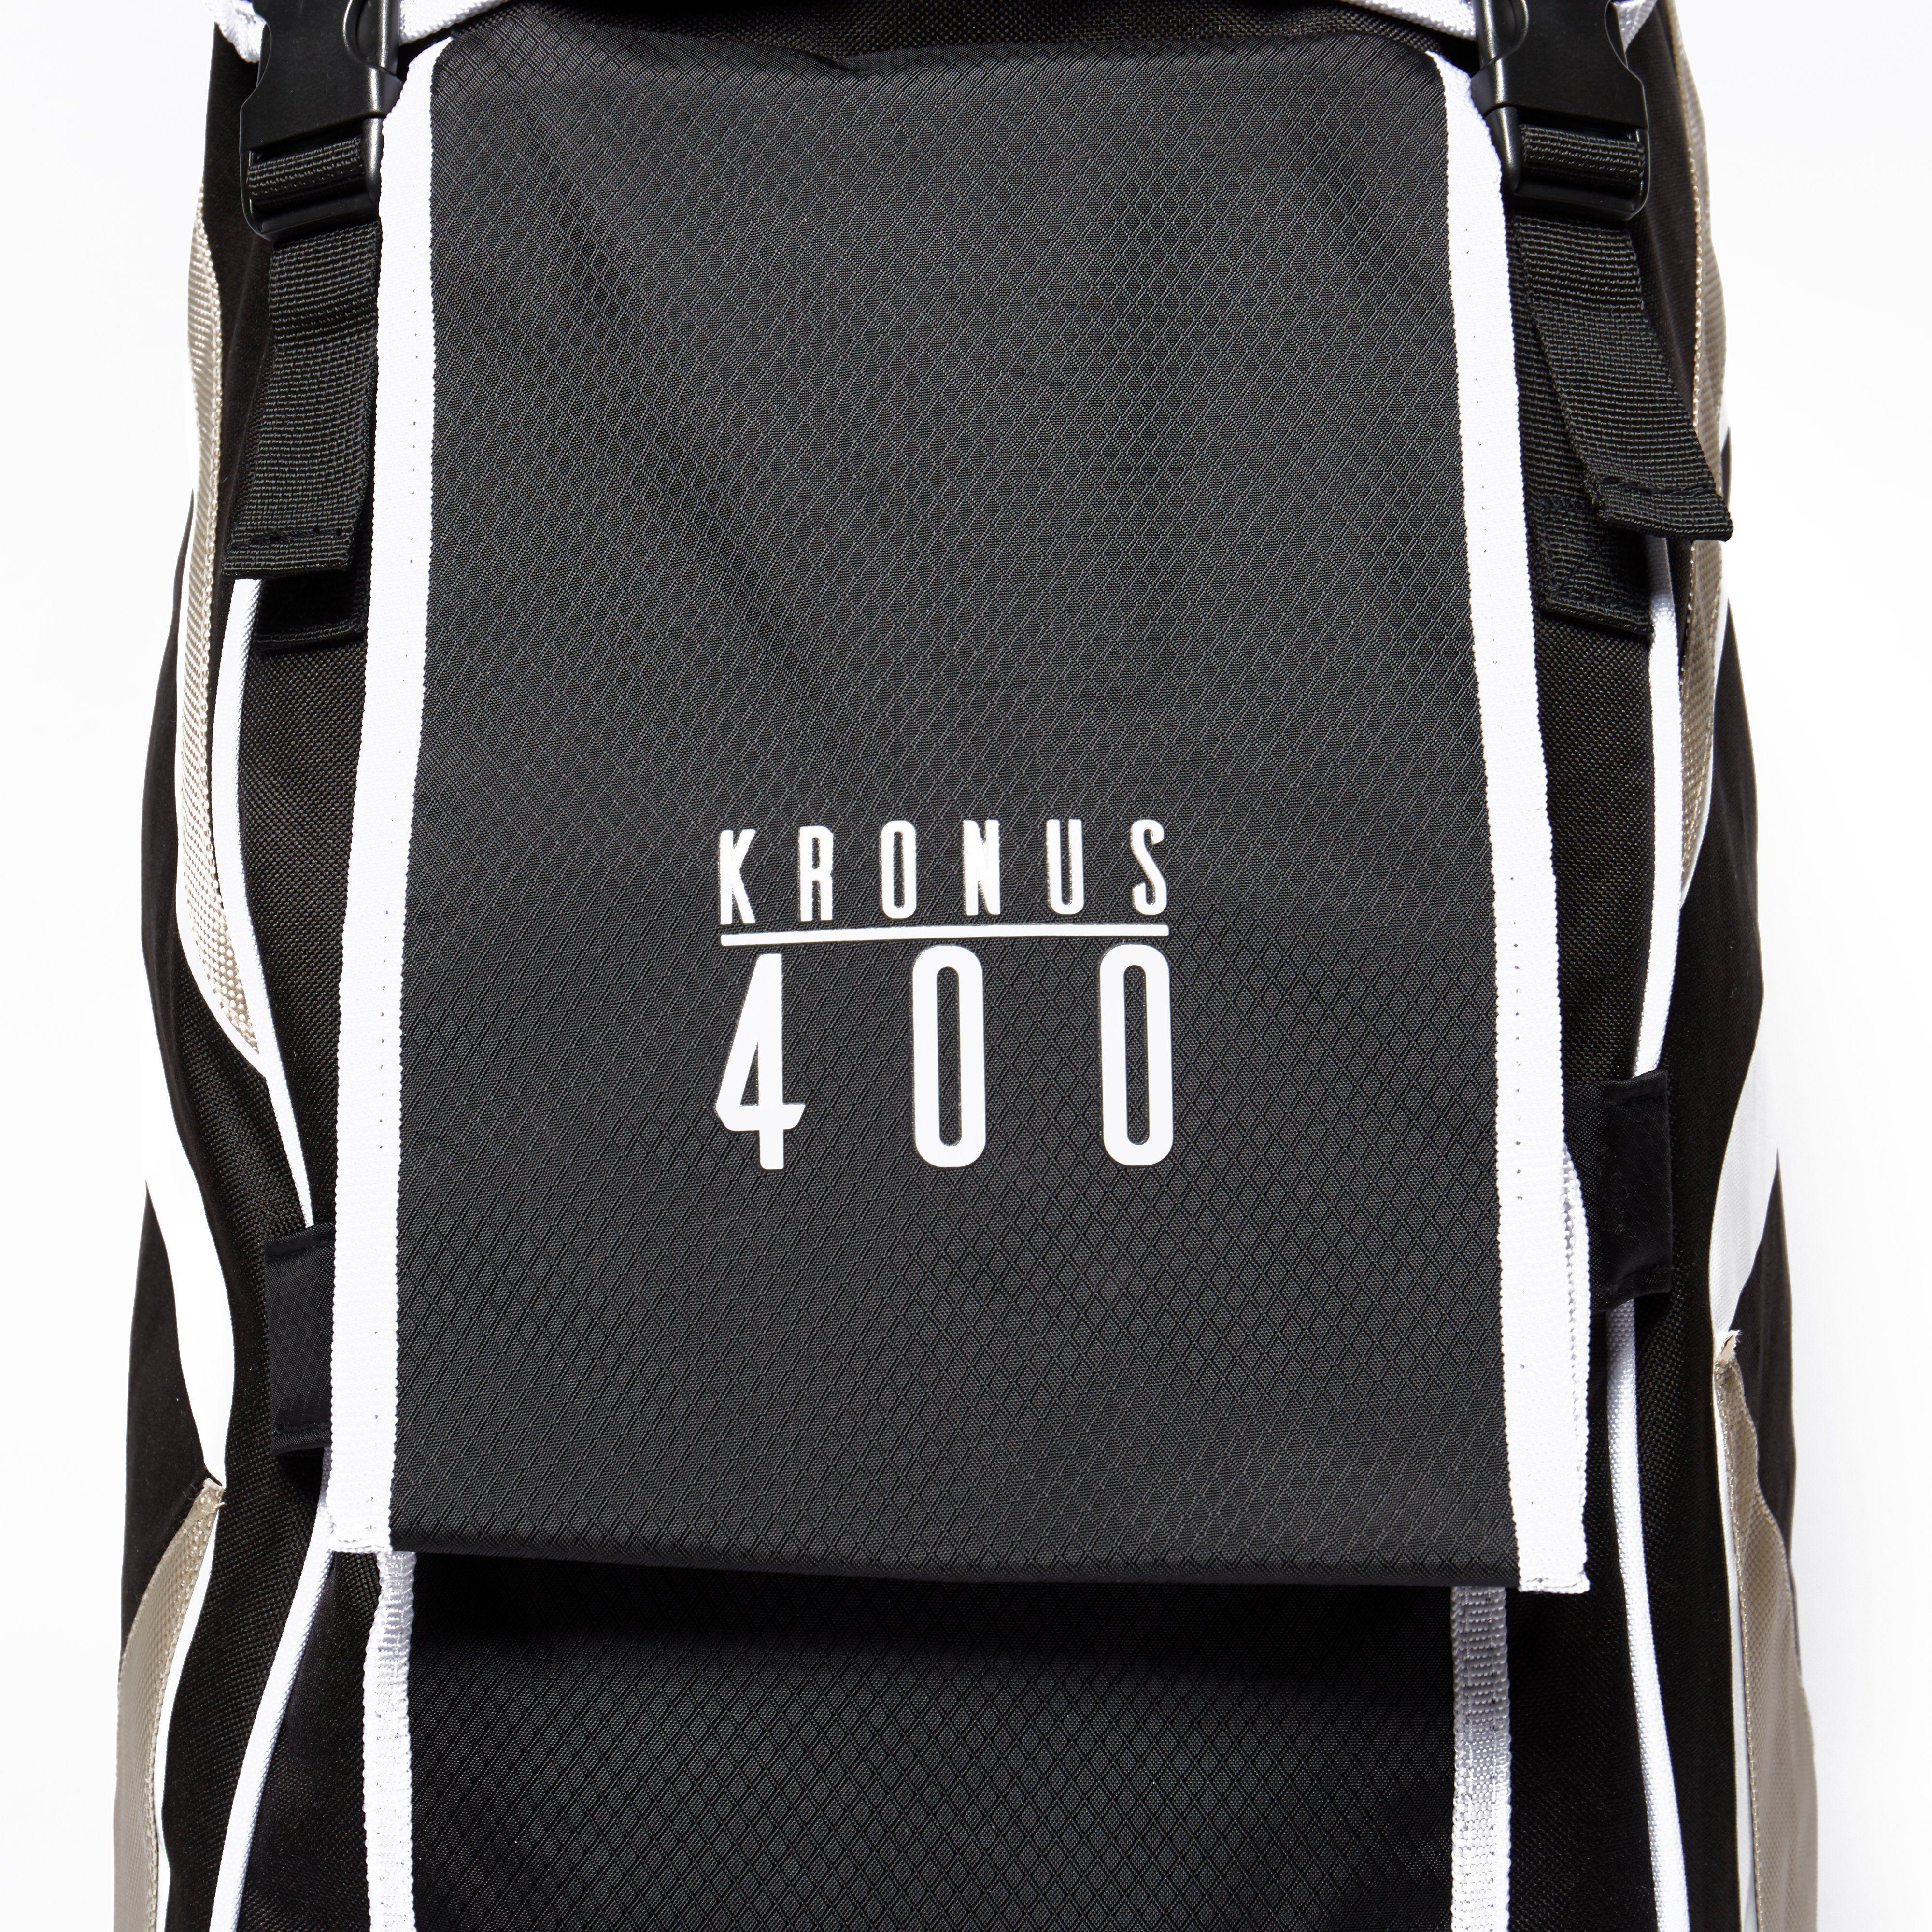 Gray-Nicolls Kronus 400 Duffel Bag